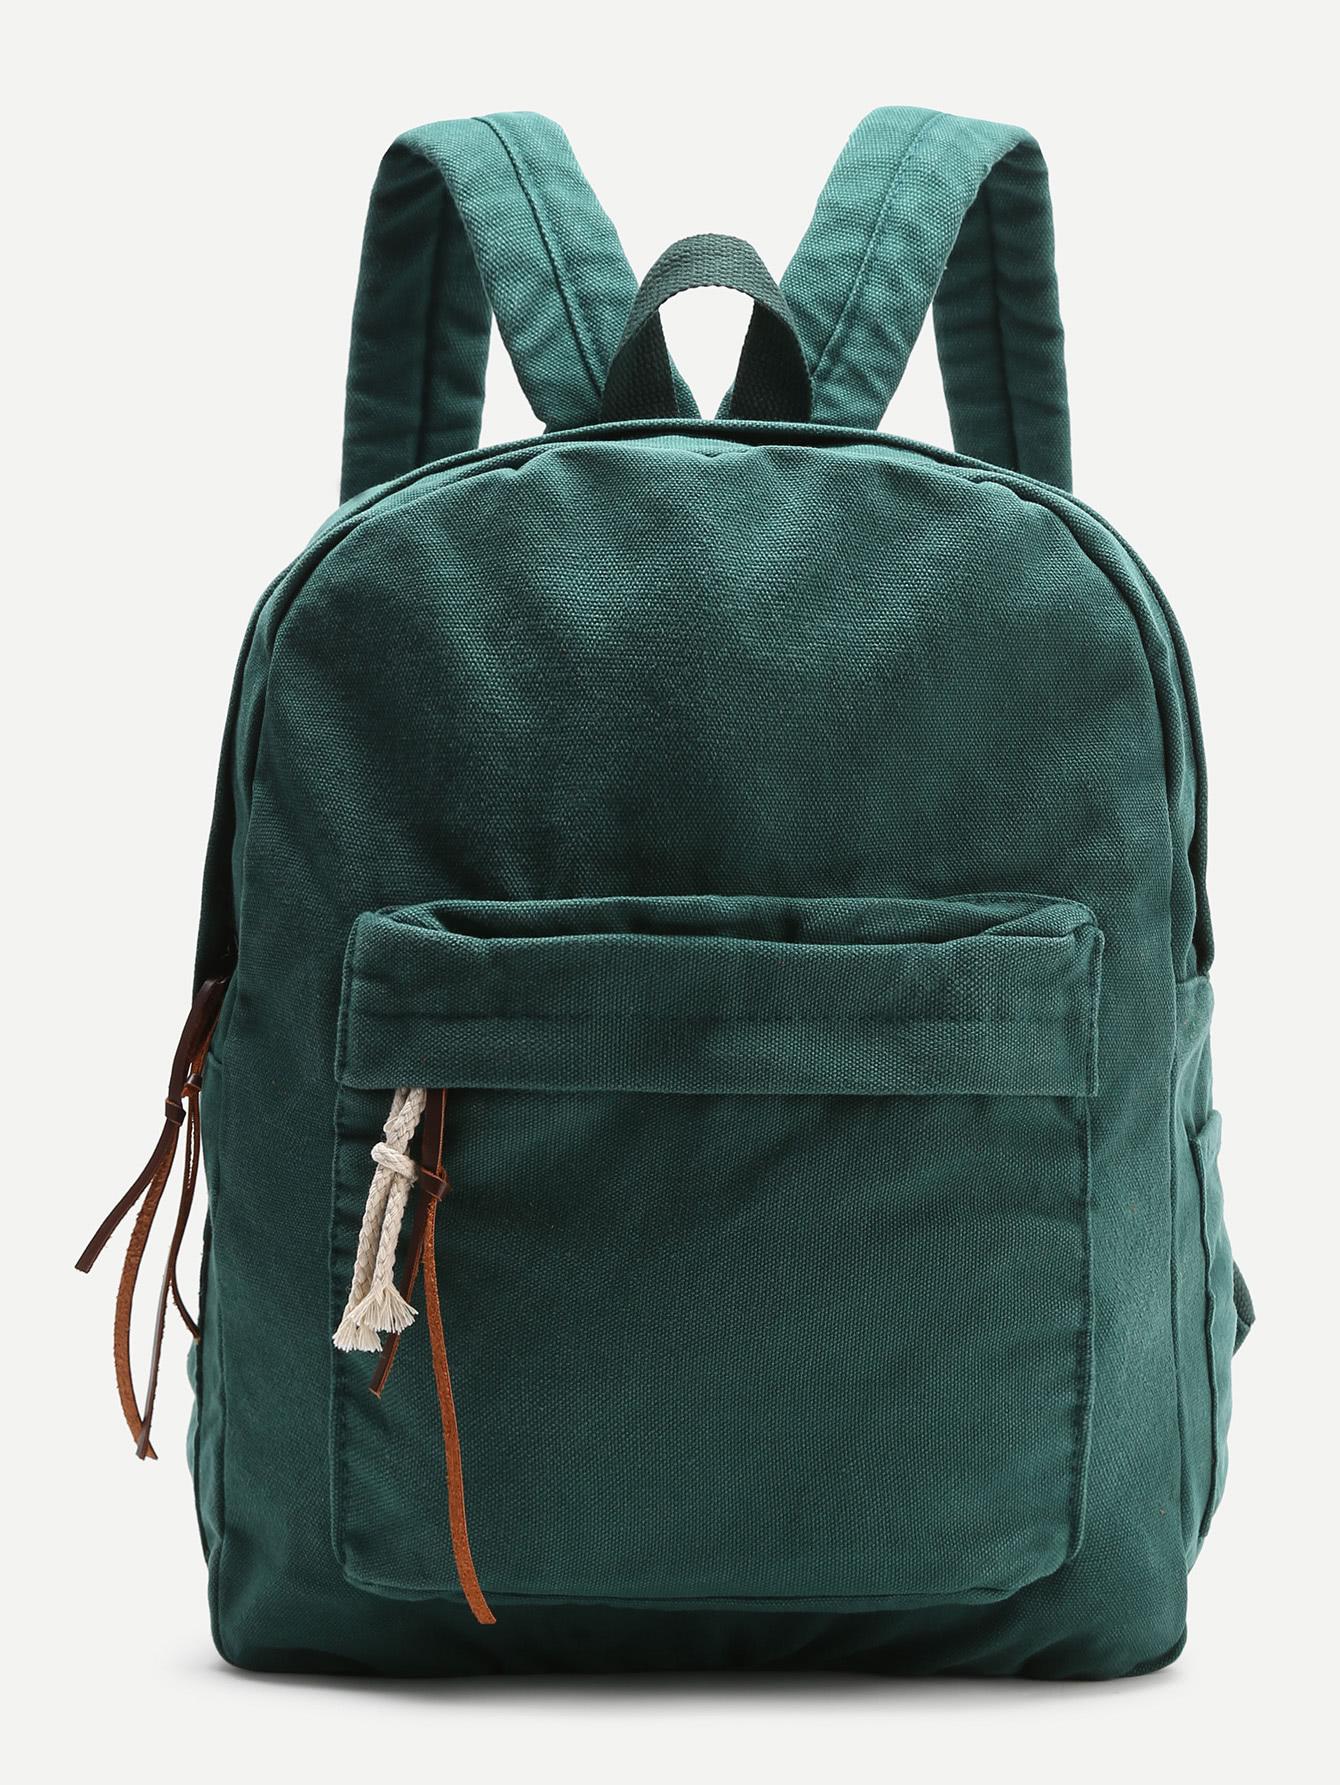 bag170213301_2